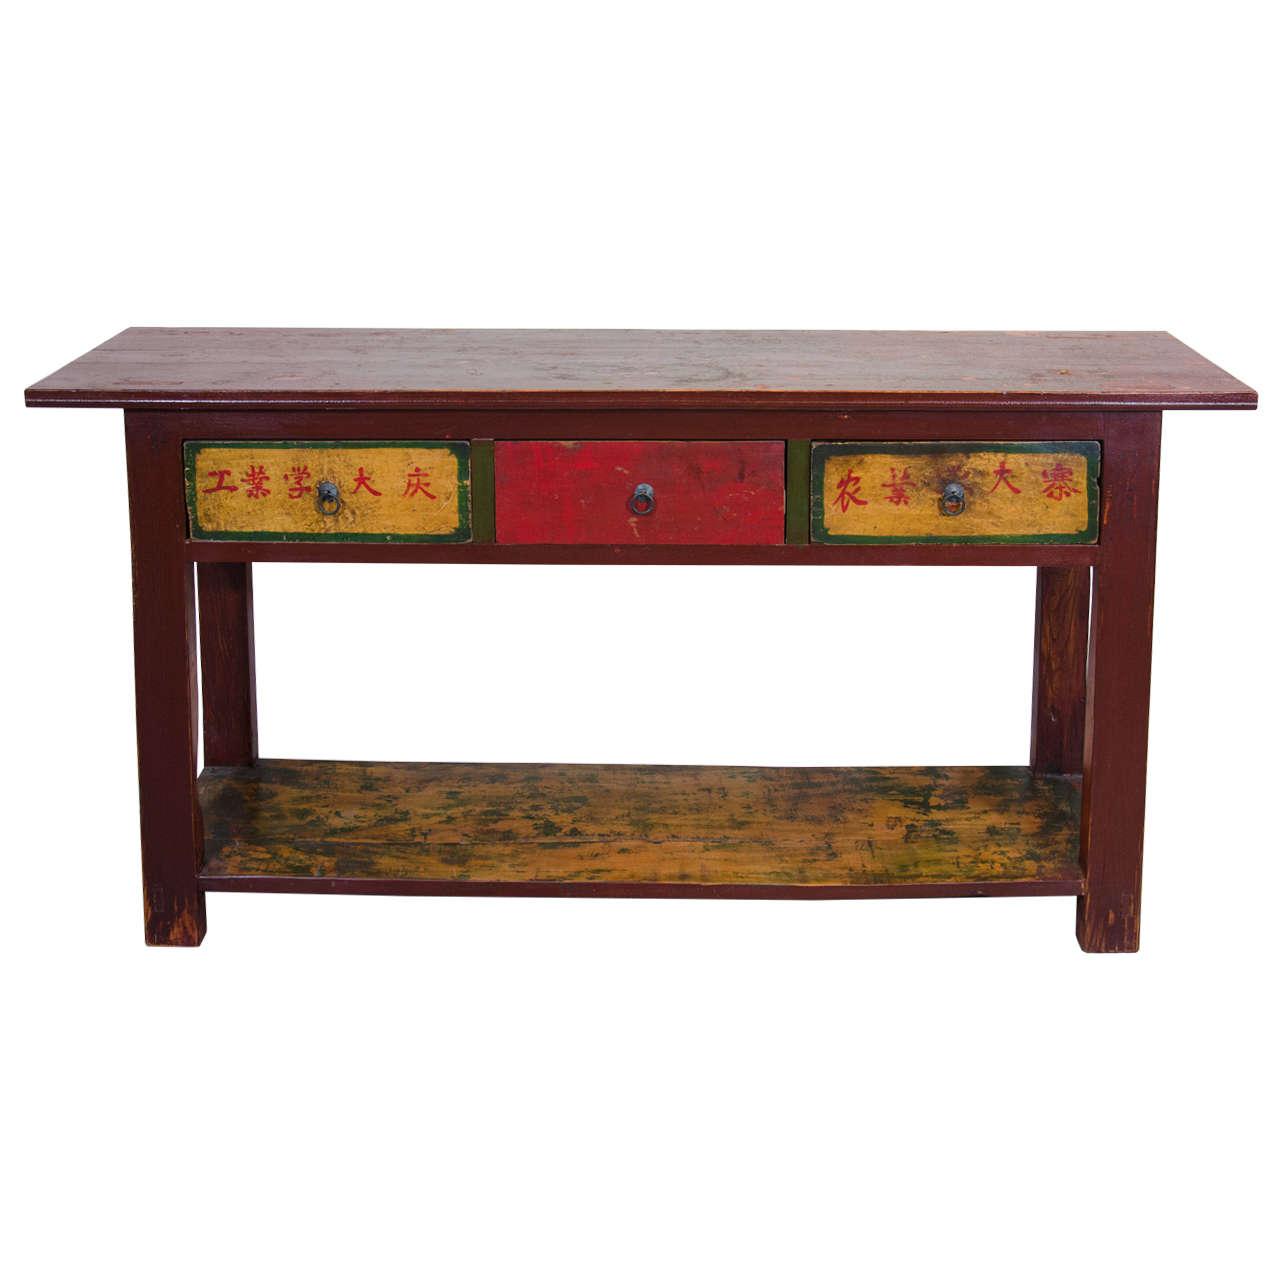 Cultural Revolution Table at 1stdibs